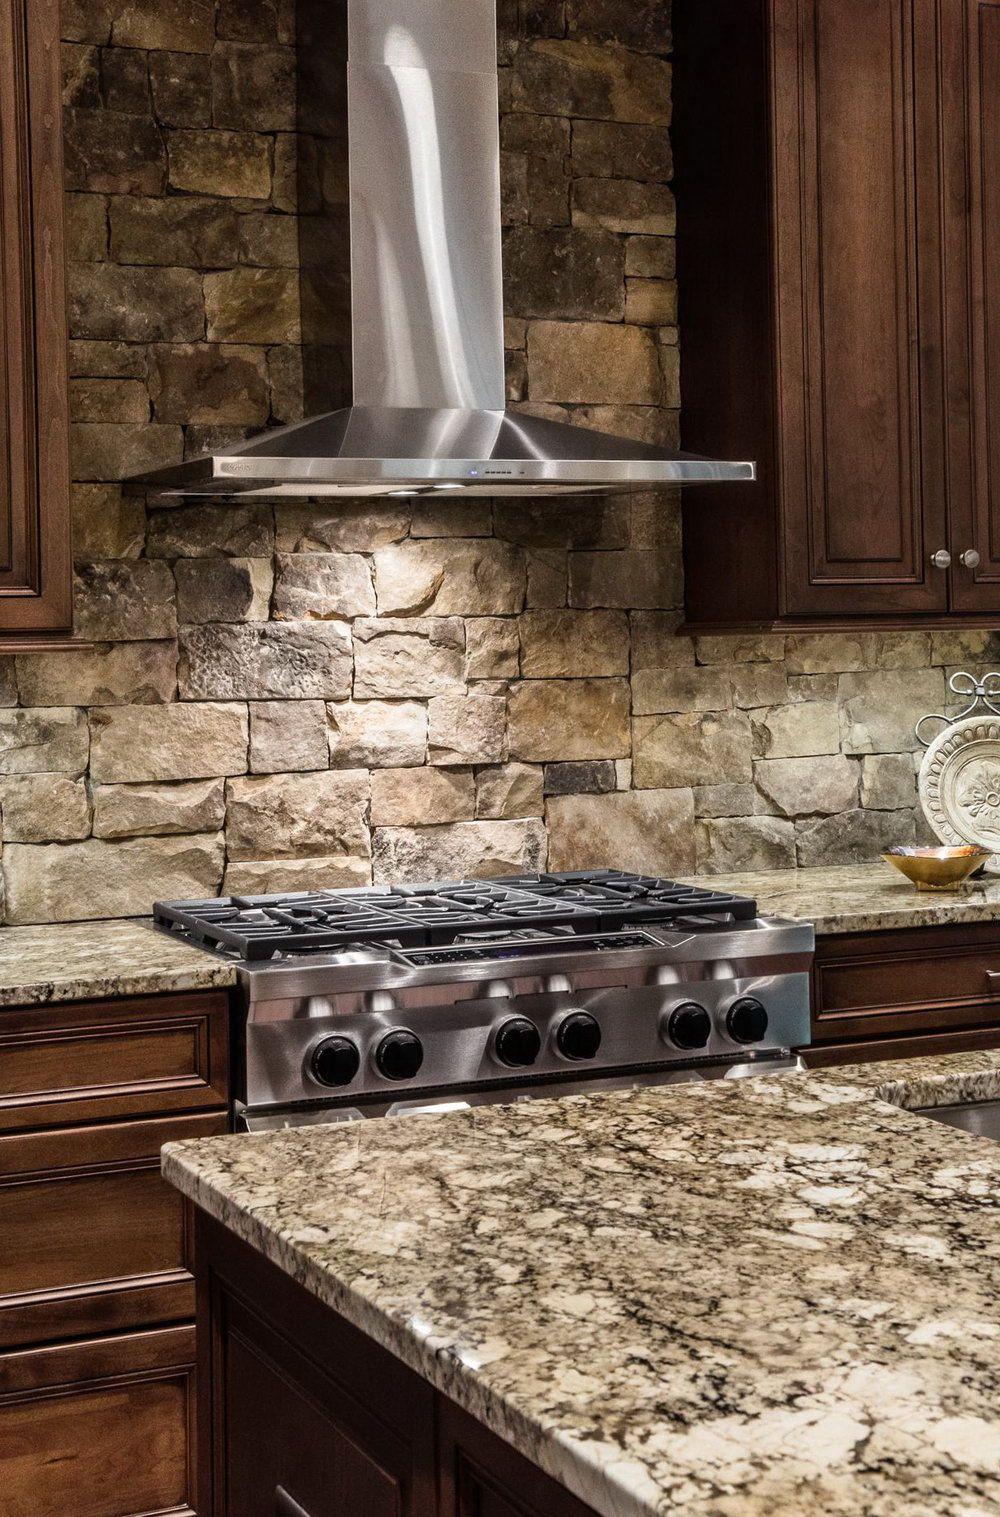 Stone Kitchen Backsplash Tile | Home Design Ideas | wood floors ...